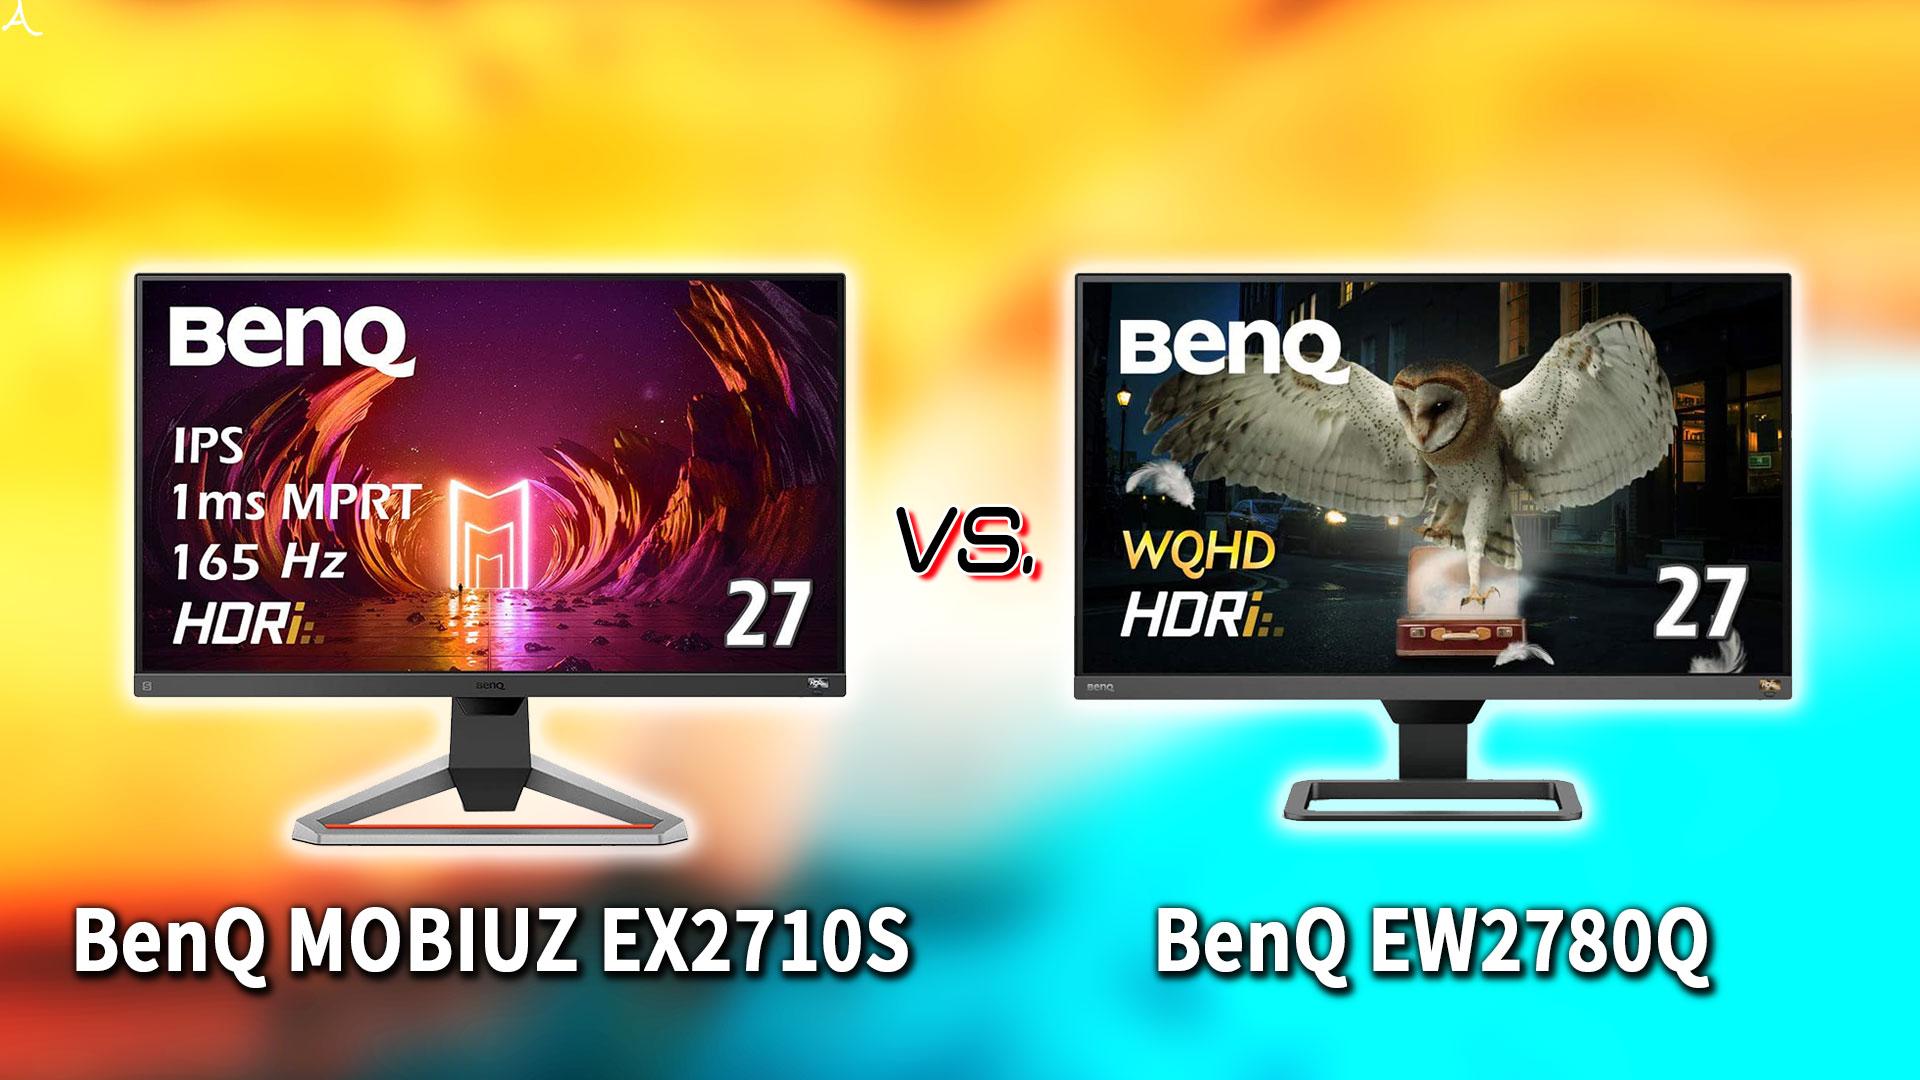 「BenQ MOBIUZ EX2510S」と「EW2780Q」の違いを比較:どっちを買う?